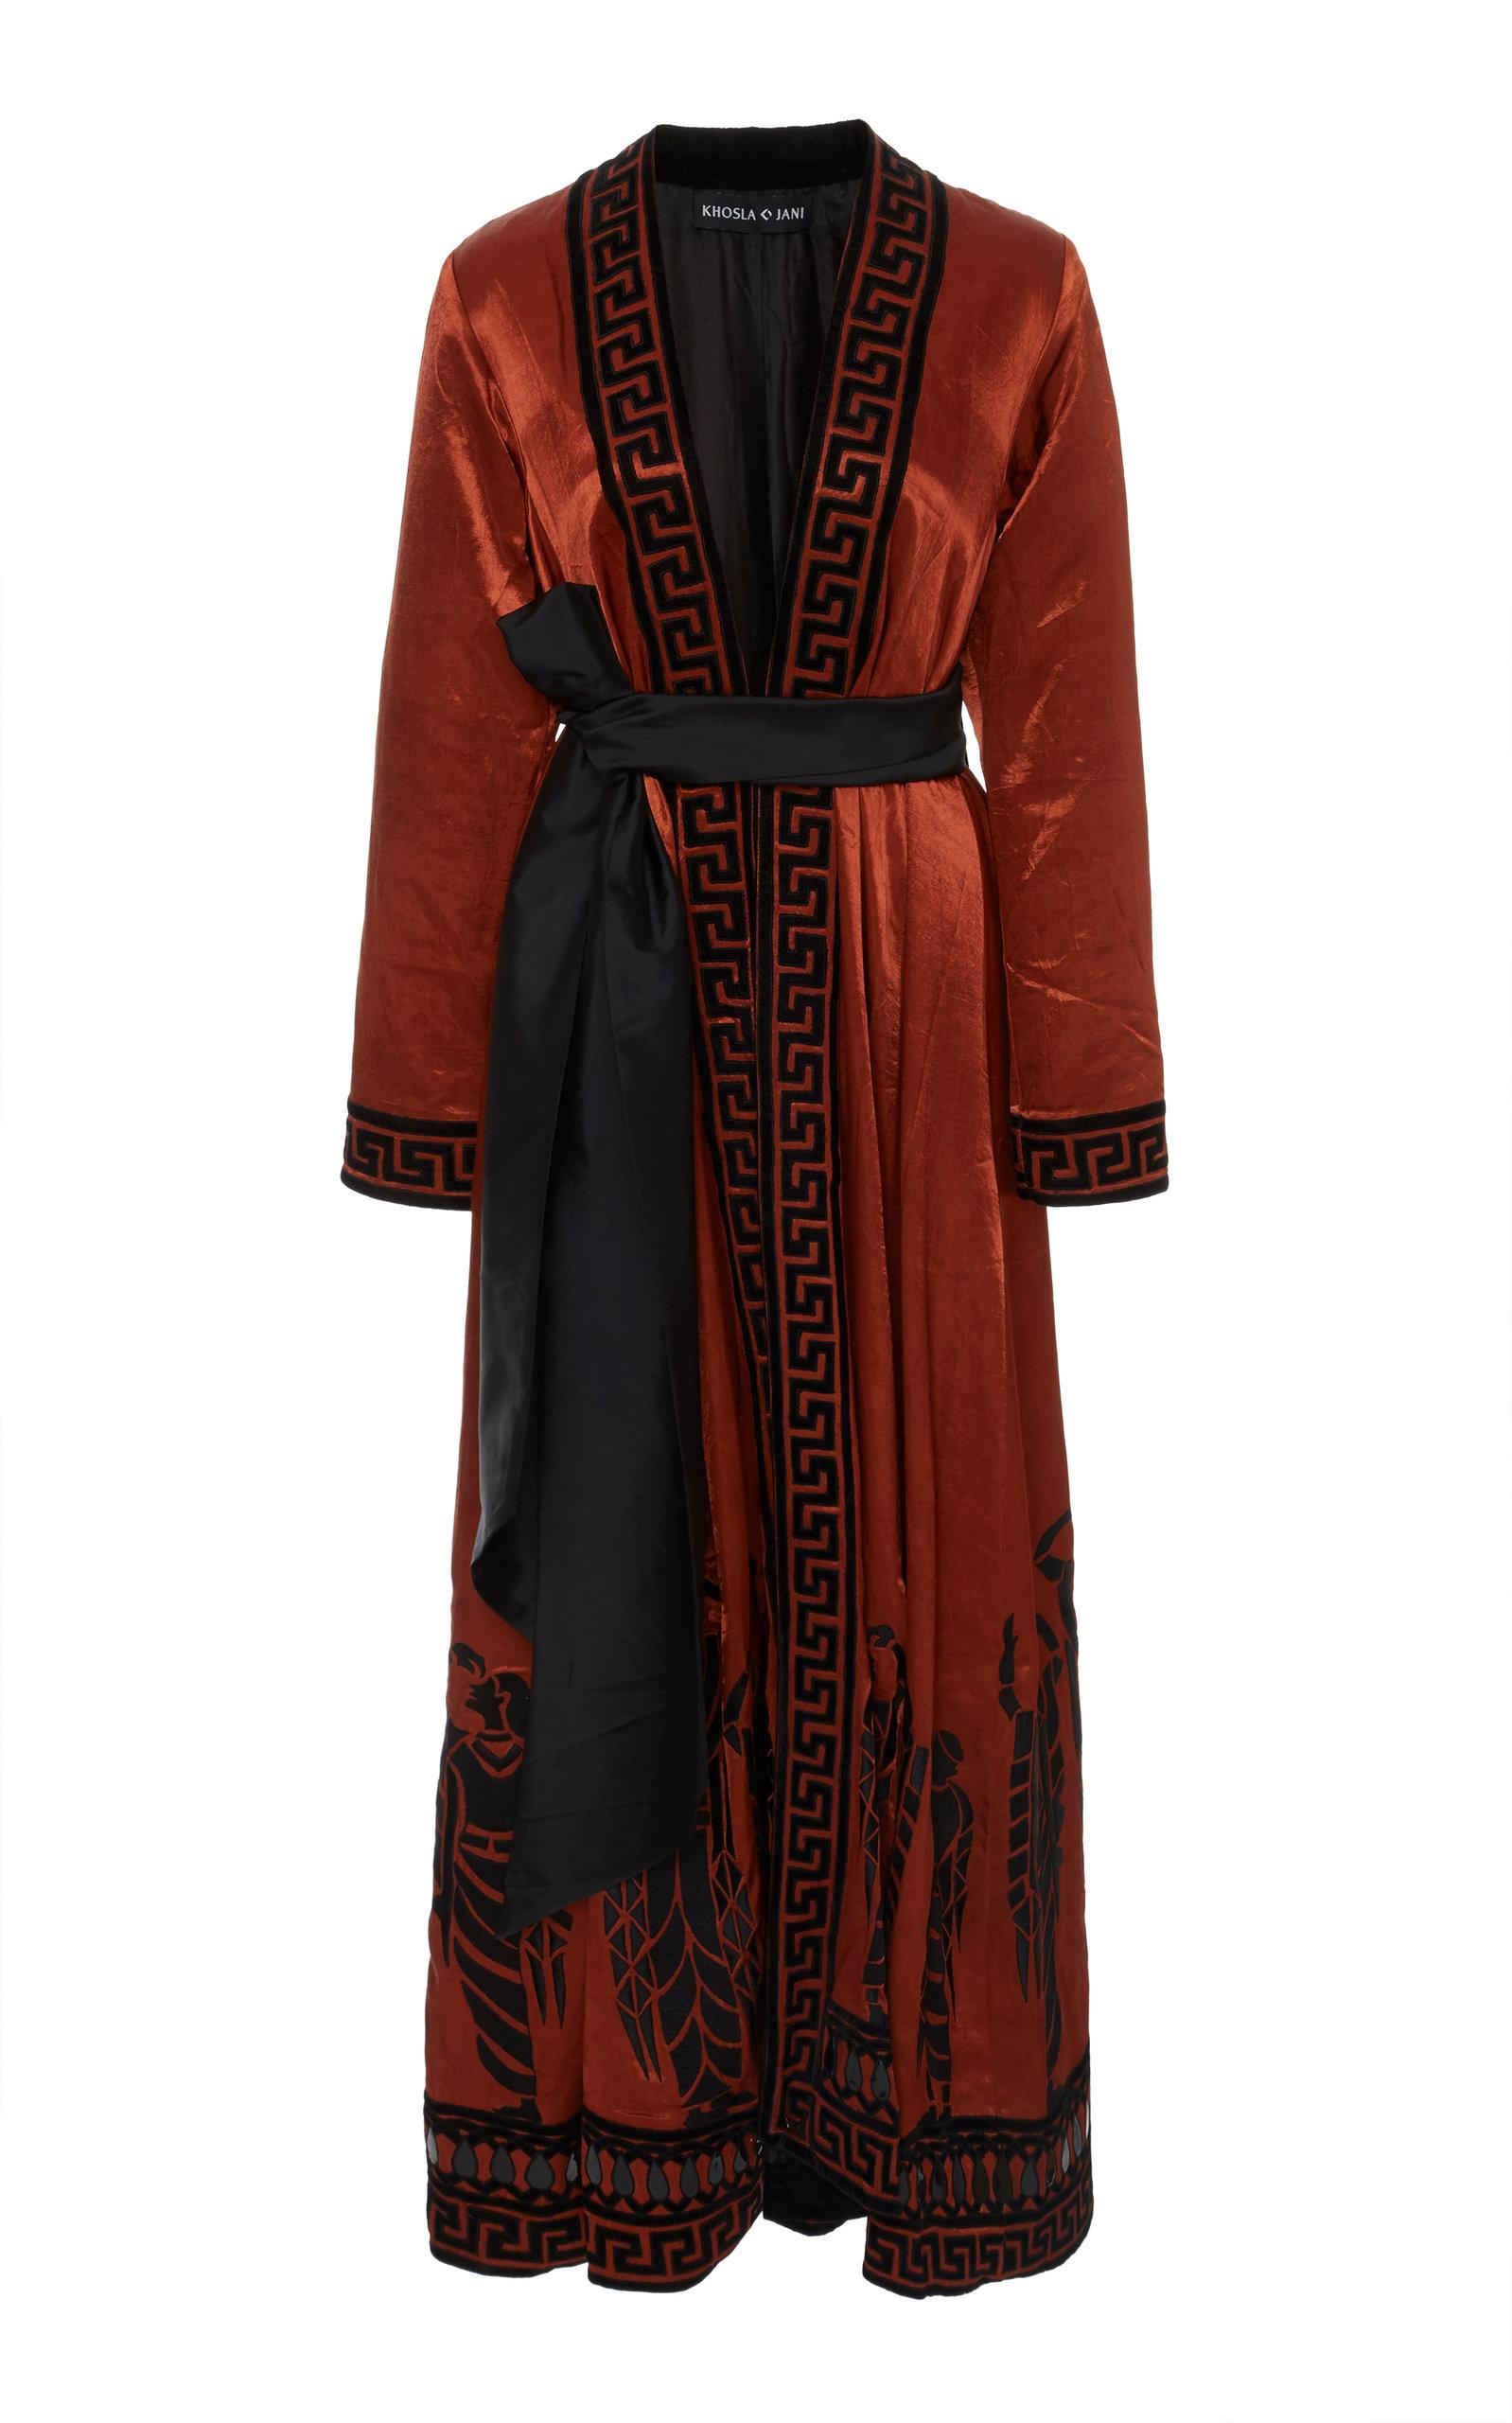 Khosla Jani Velvet Dancer Coat In Brown